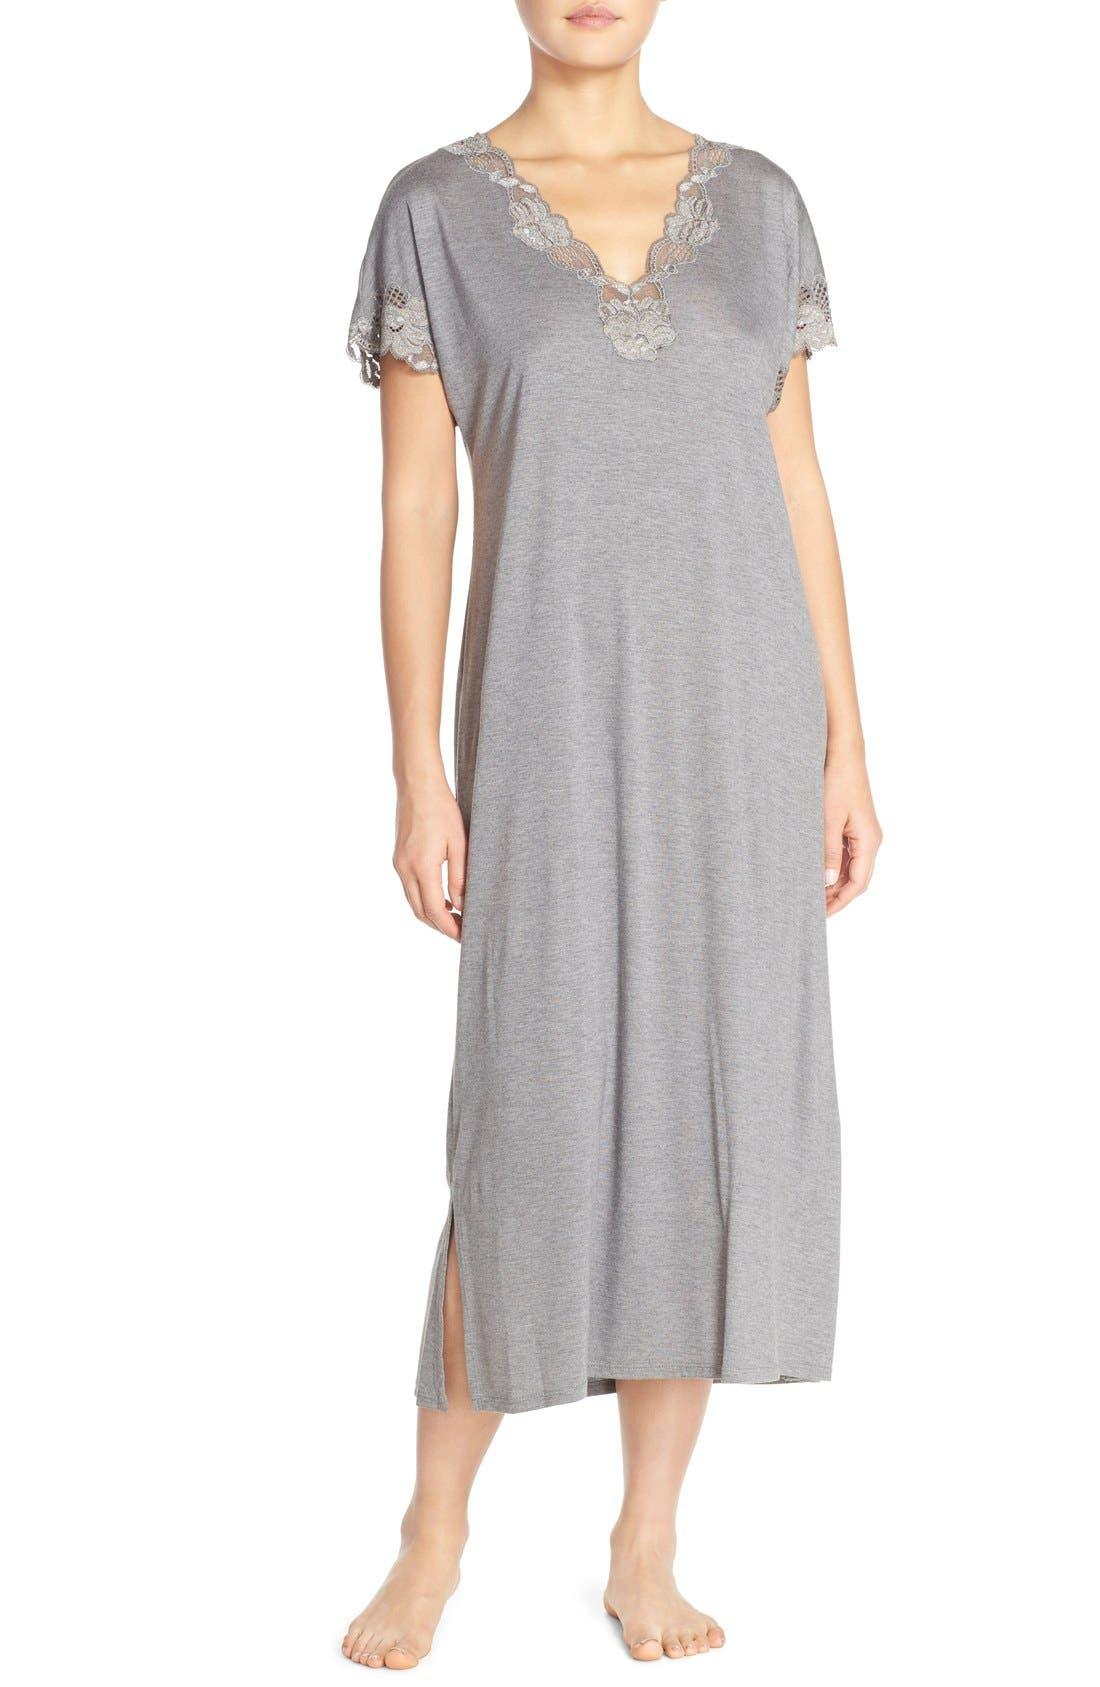 'Zen' Short SleeveNightgown,                         Main,                         color, Heather Grey